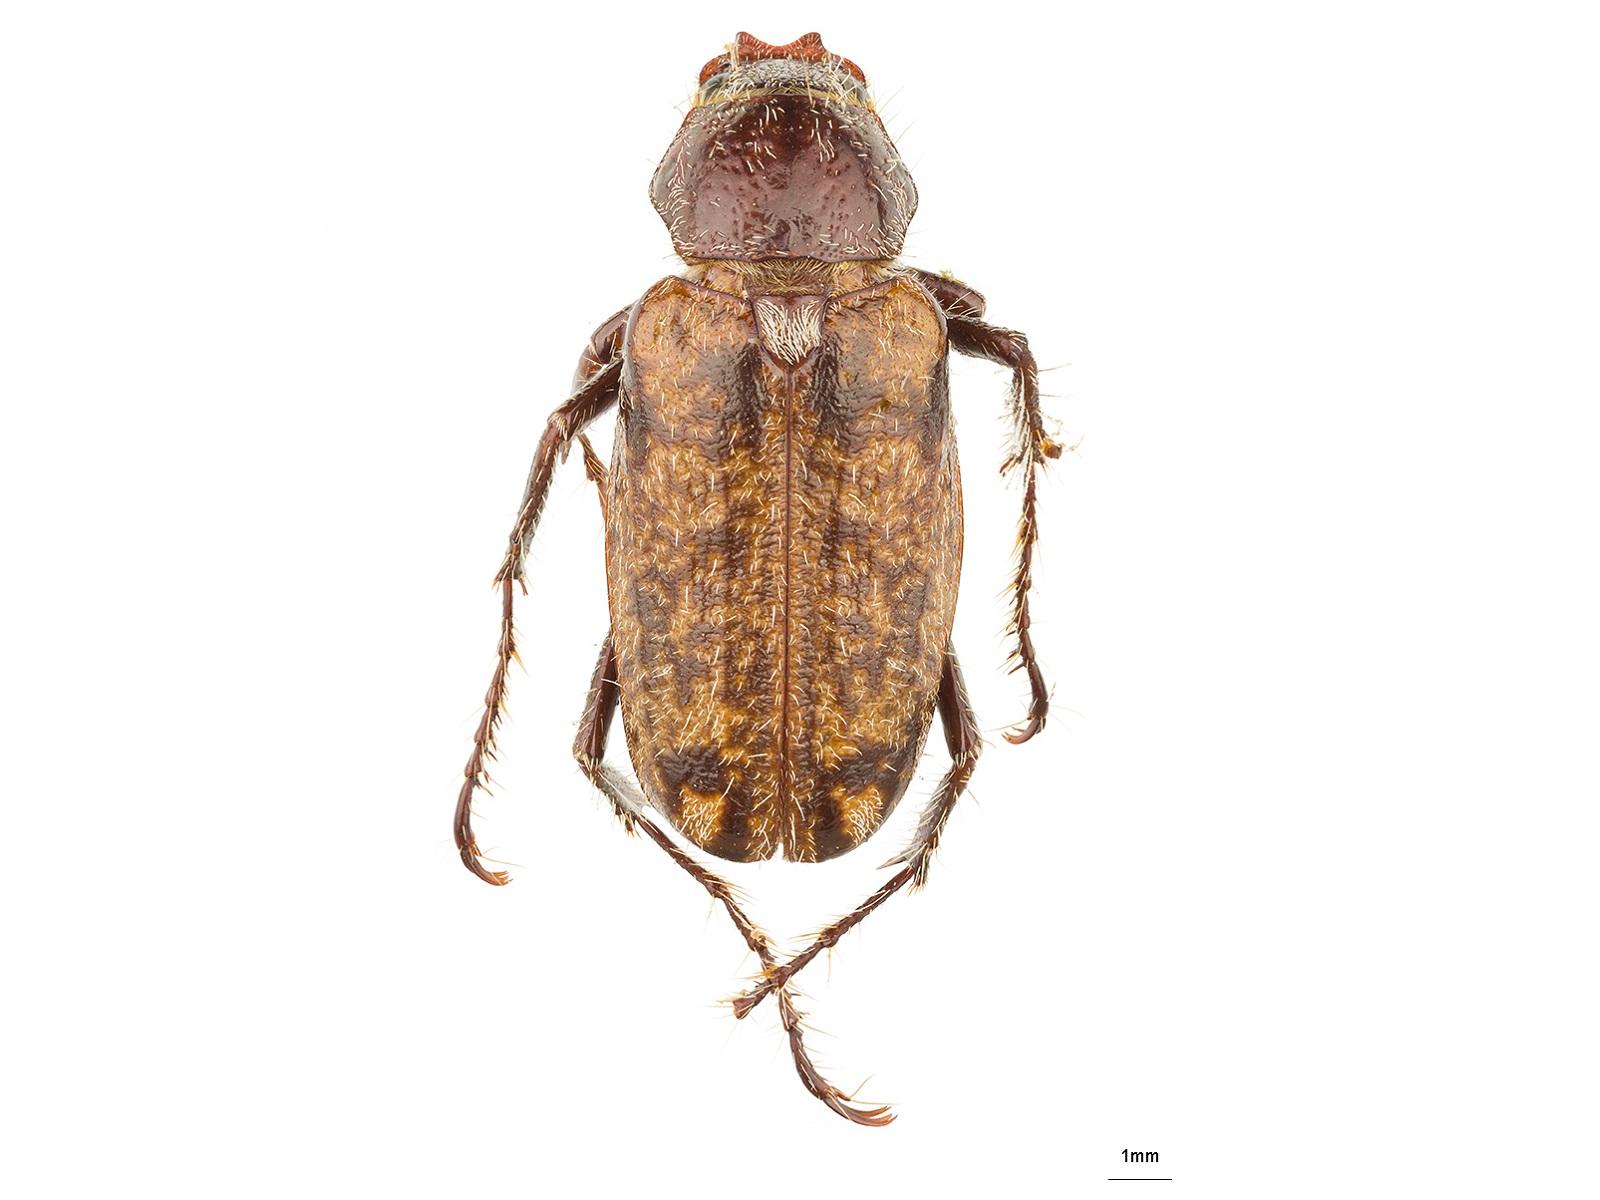 Manopus biguttatus Laporte de Castelnau, 1840